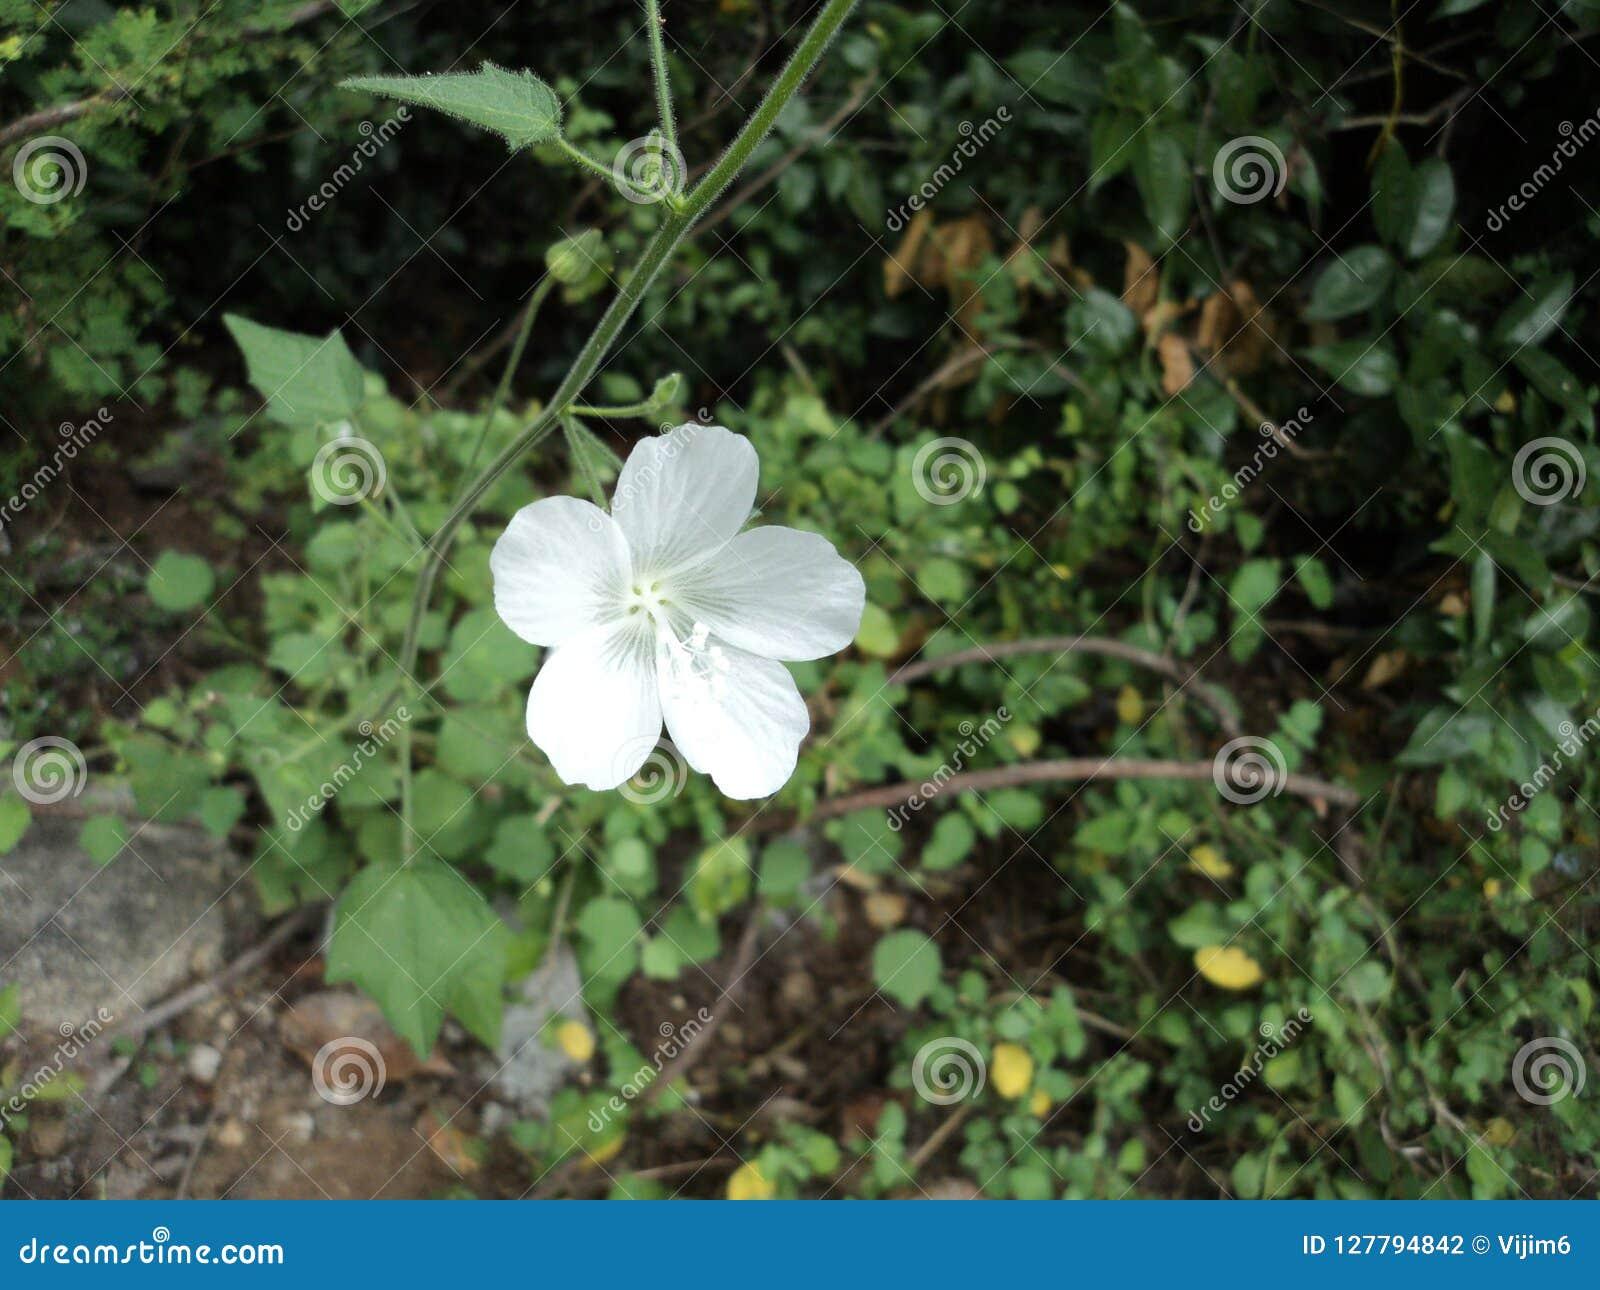 Beautiful White Weed Flower In The Kalakad Mundanthurai Forest Stock ...